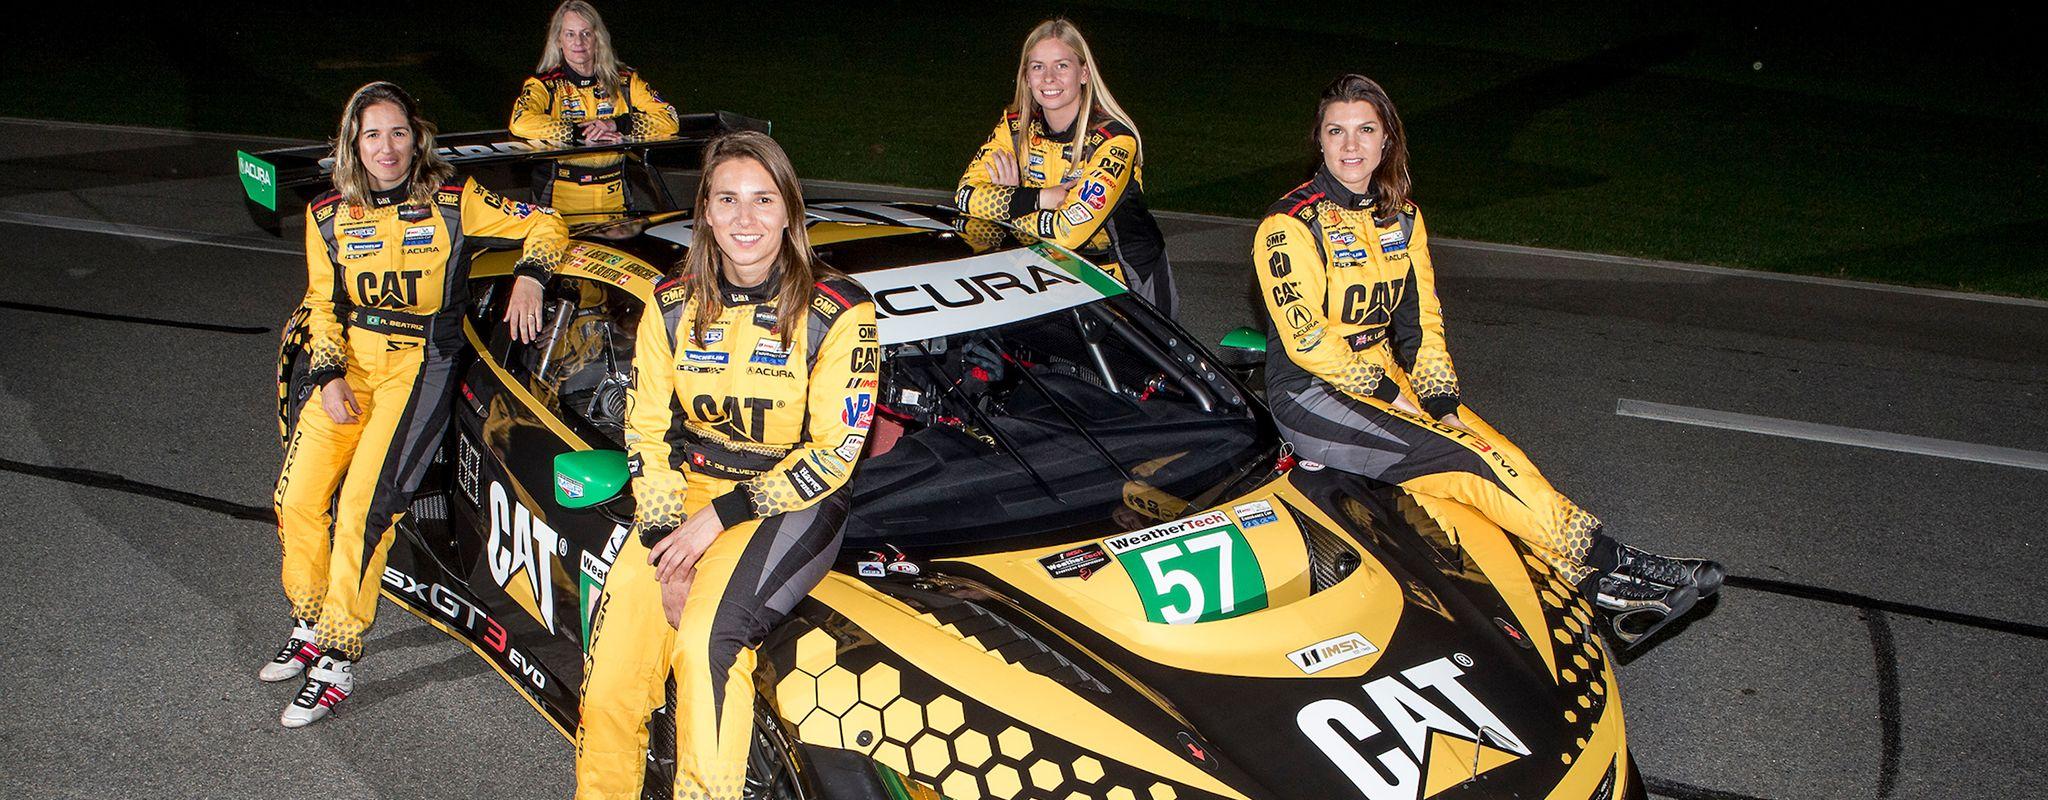 racing team 57